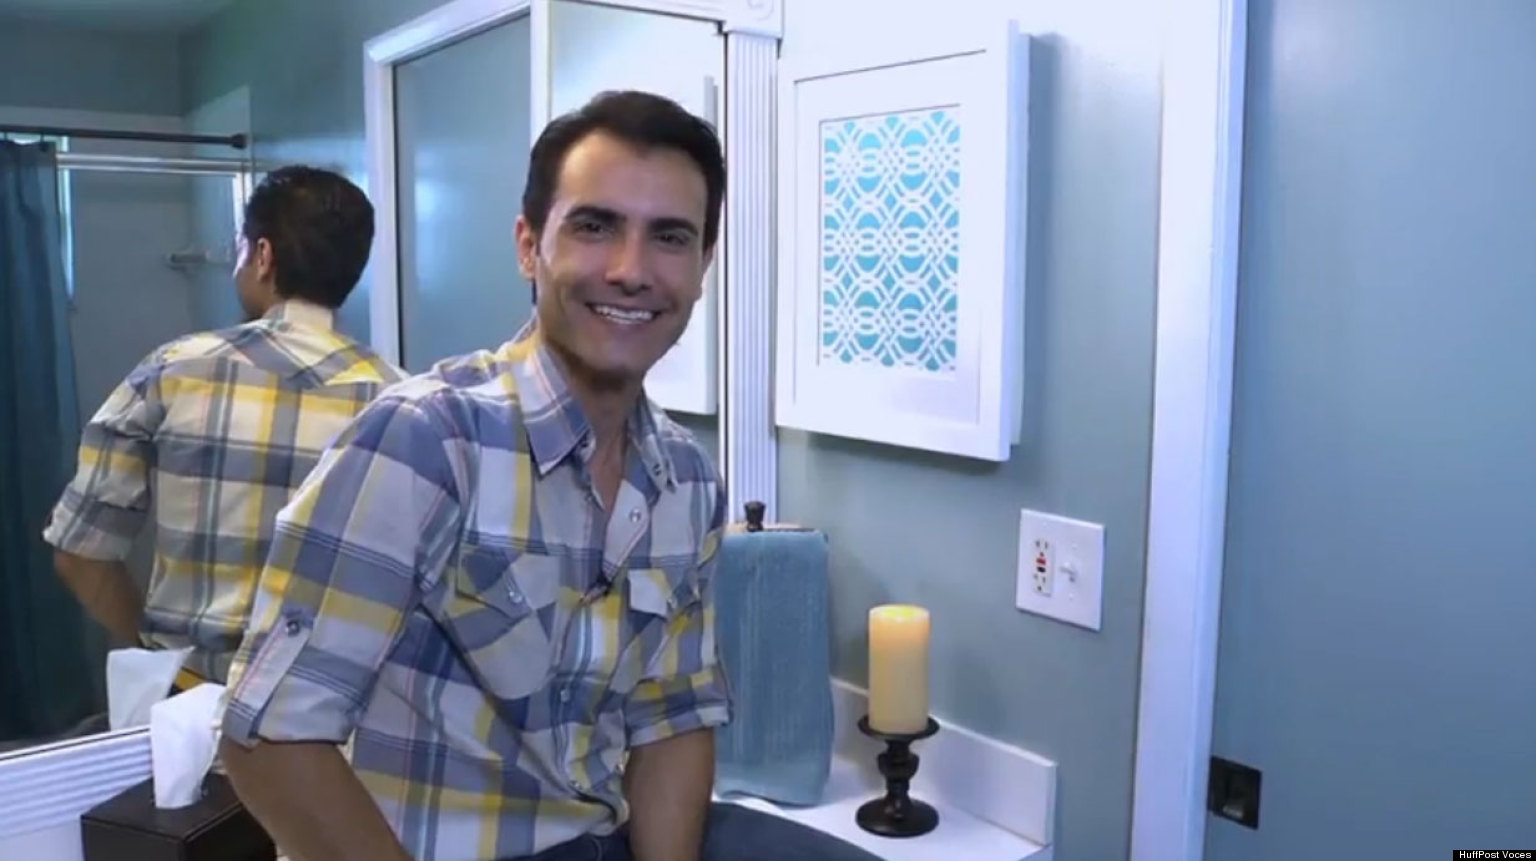 Medidas De Un Botiquin Para Baño:Transforma tu botiquín en una obra de arte (VIDEO)